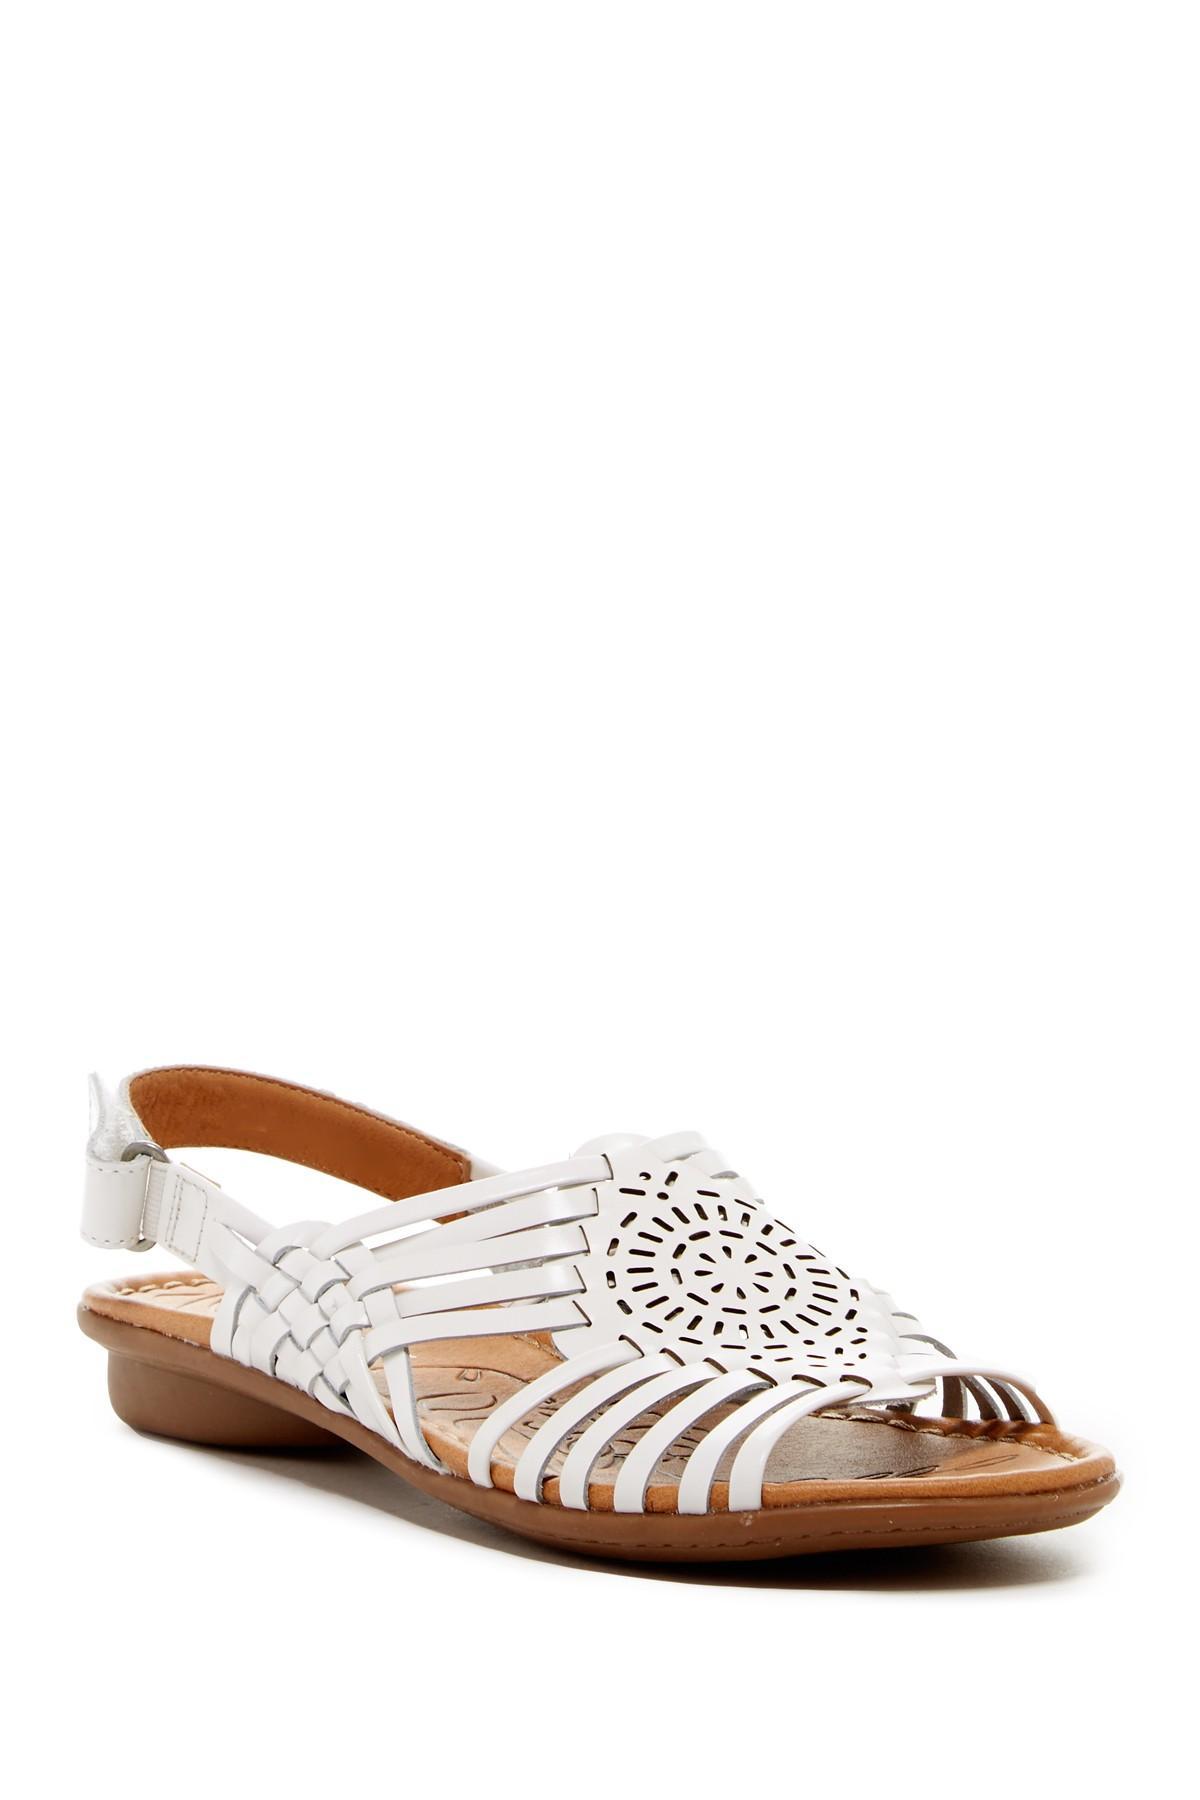 Lyst Naturalizer Wendy Huarache Sandal Wide Width